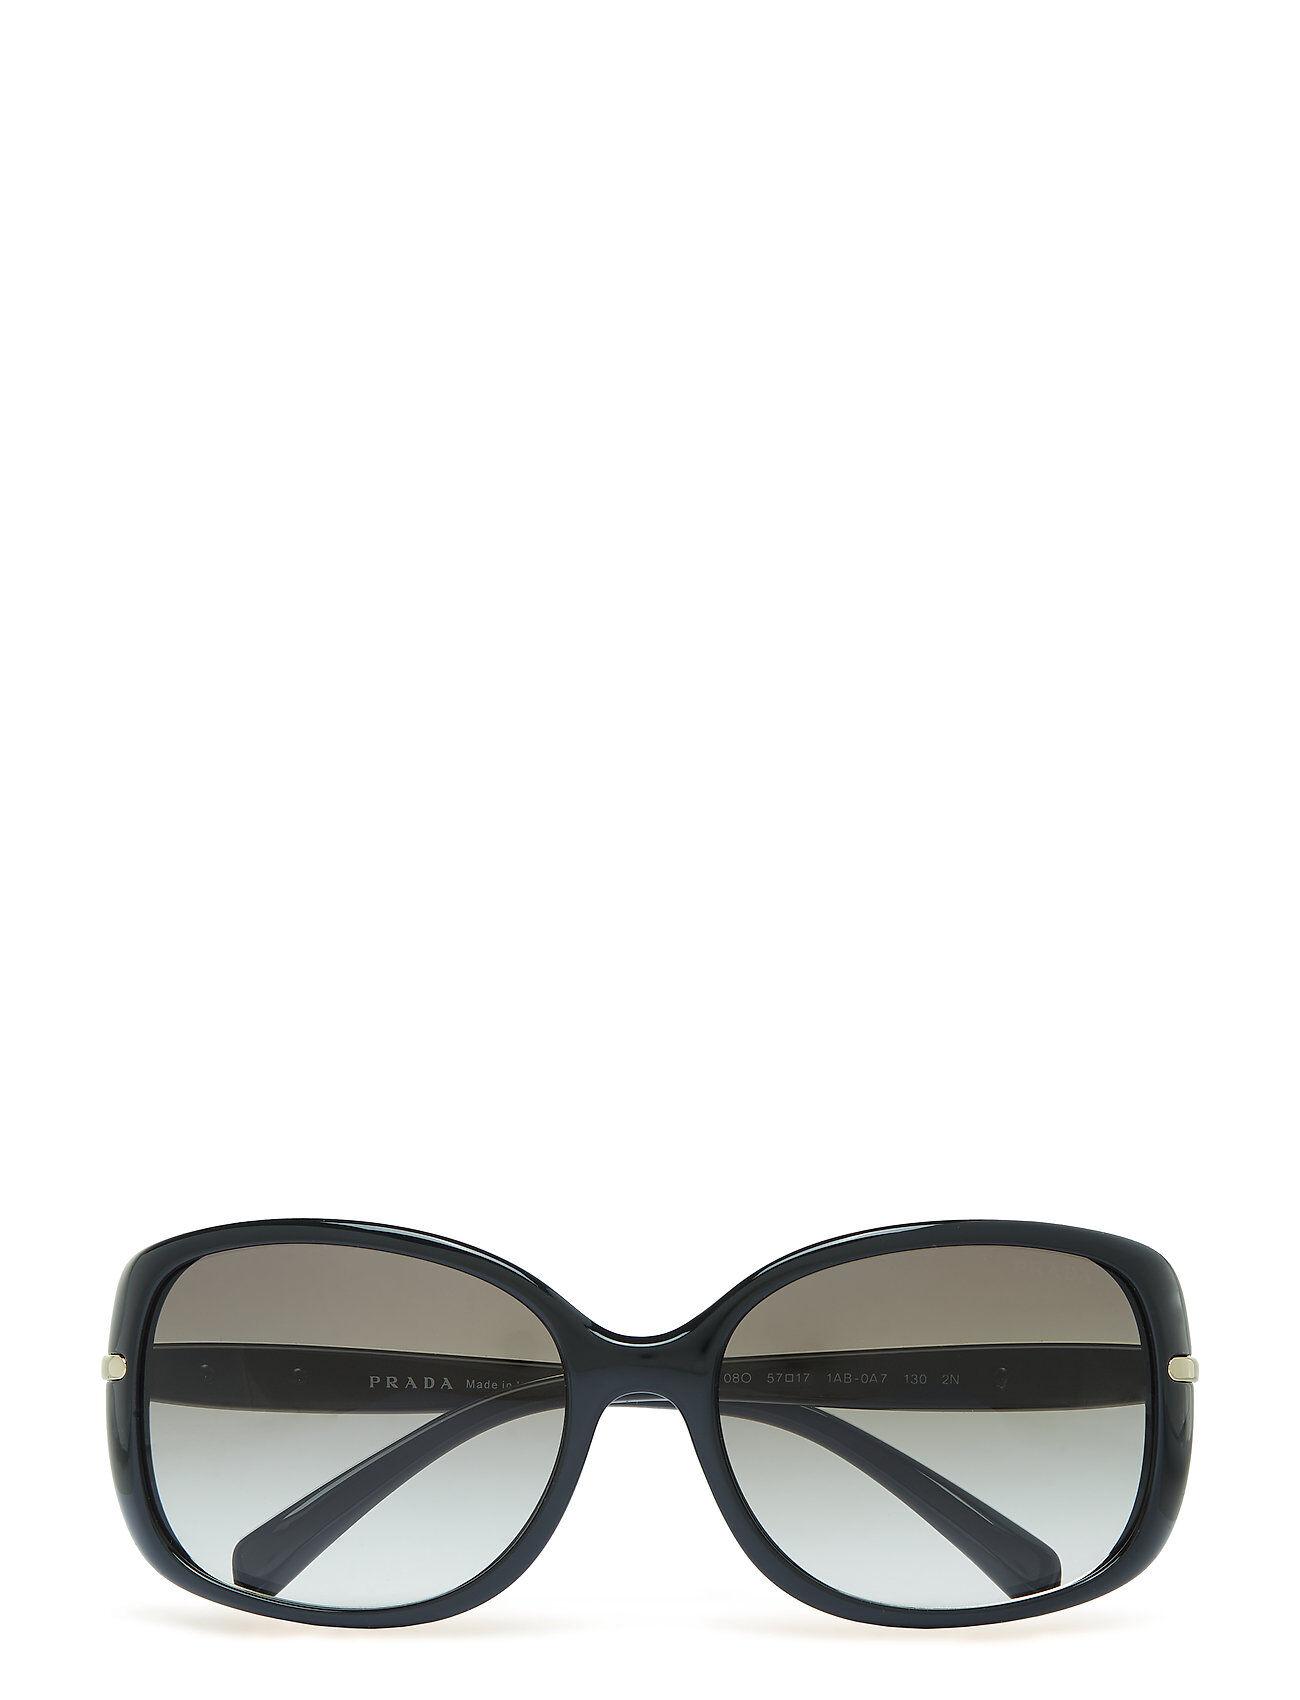 Image of Prada Sunglasses Conceptual   Arrow Wayfarer Aurinkolasit Musta Prada Sunglasses